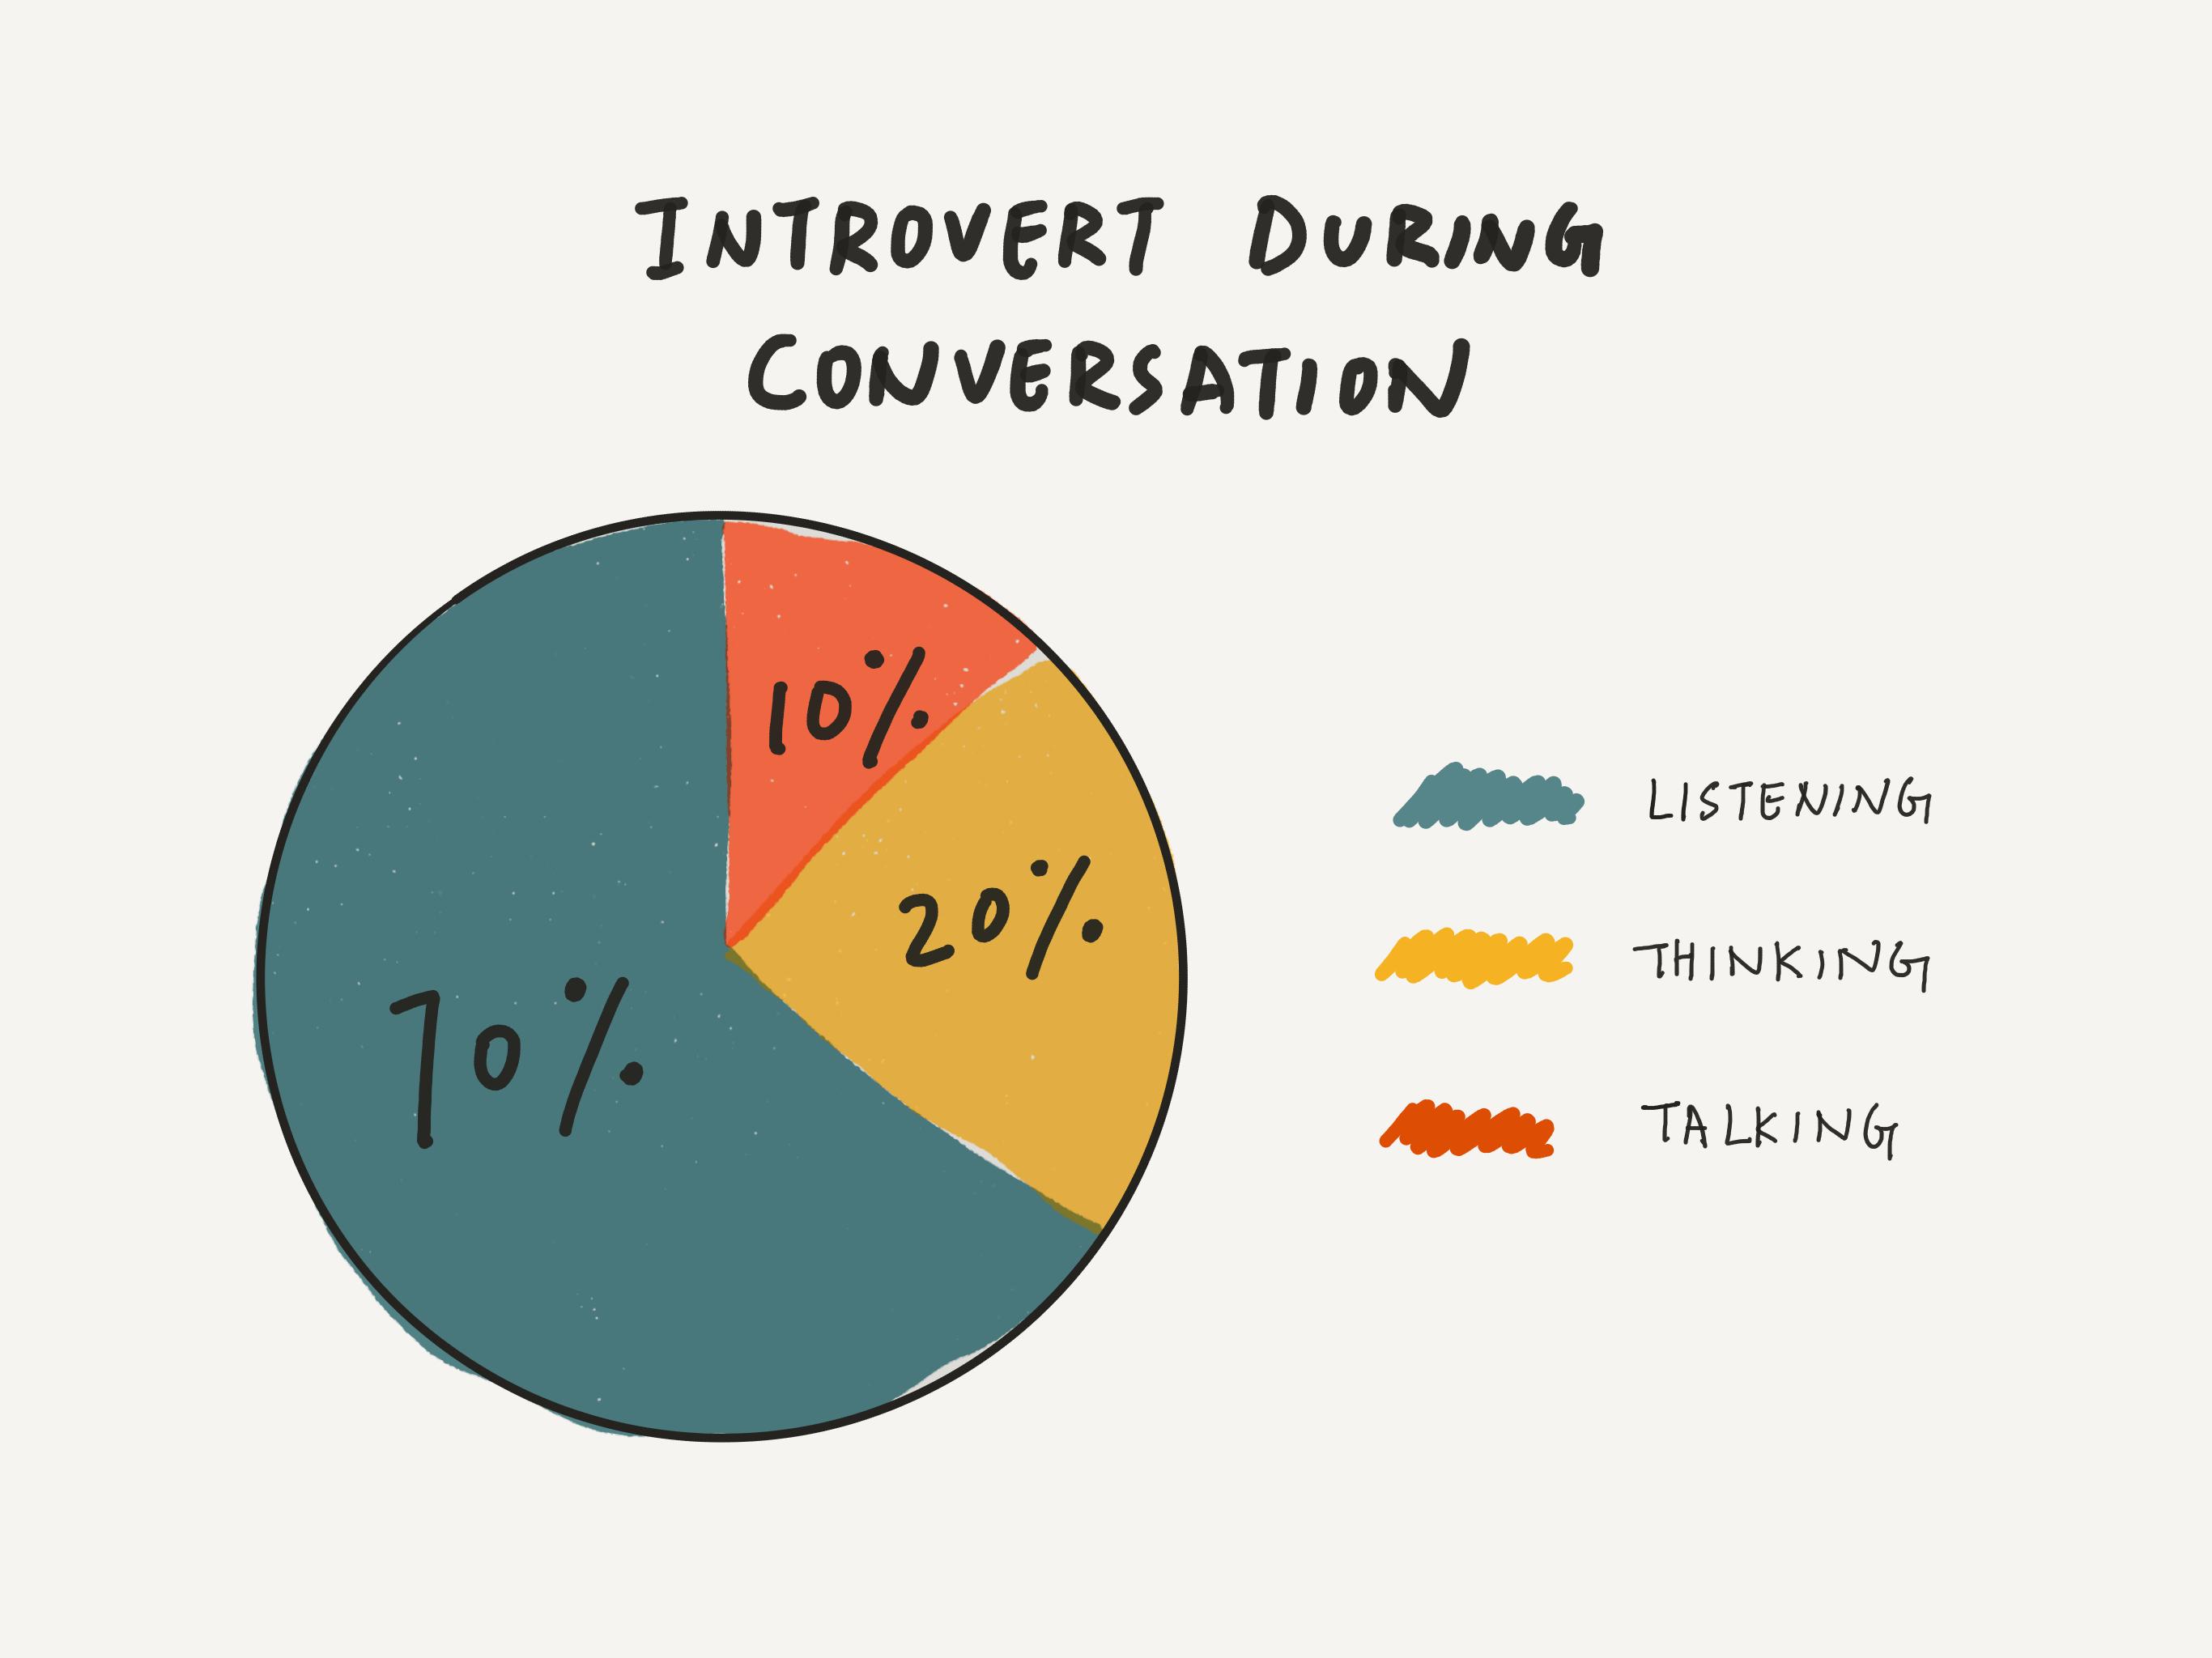 introverta